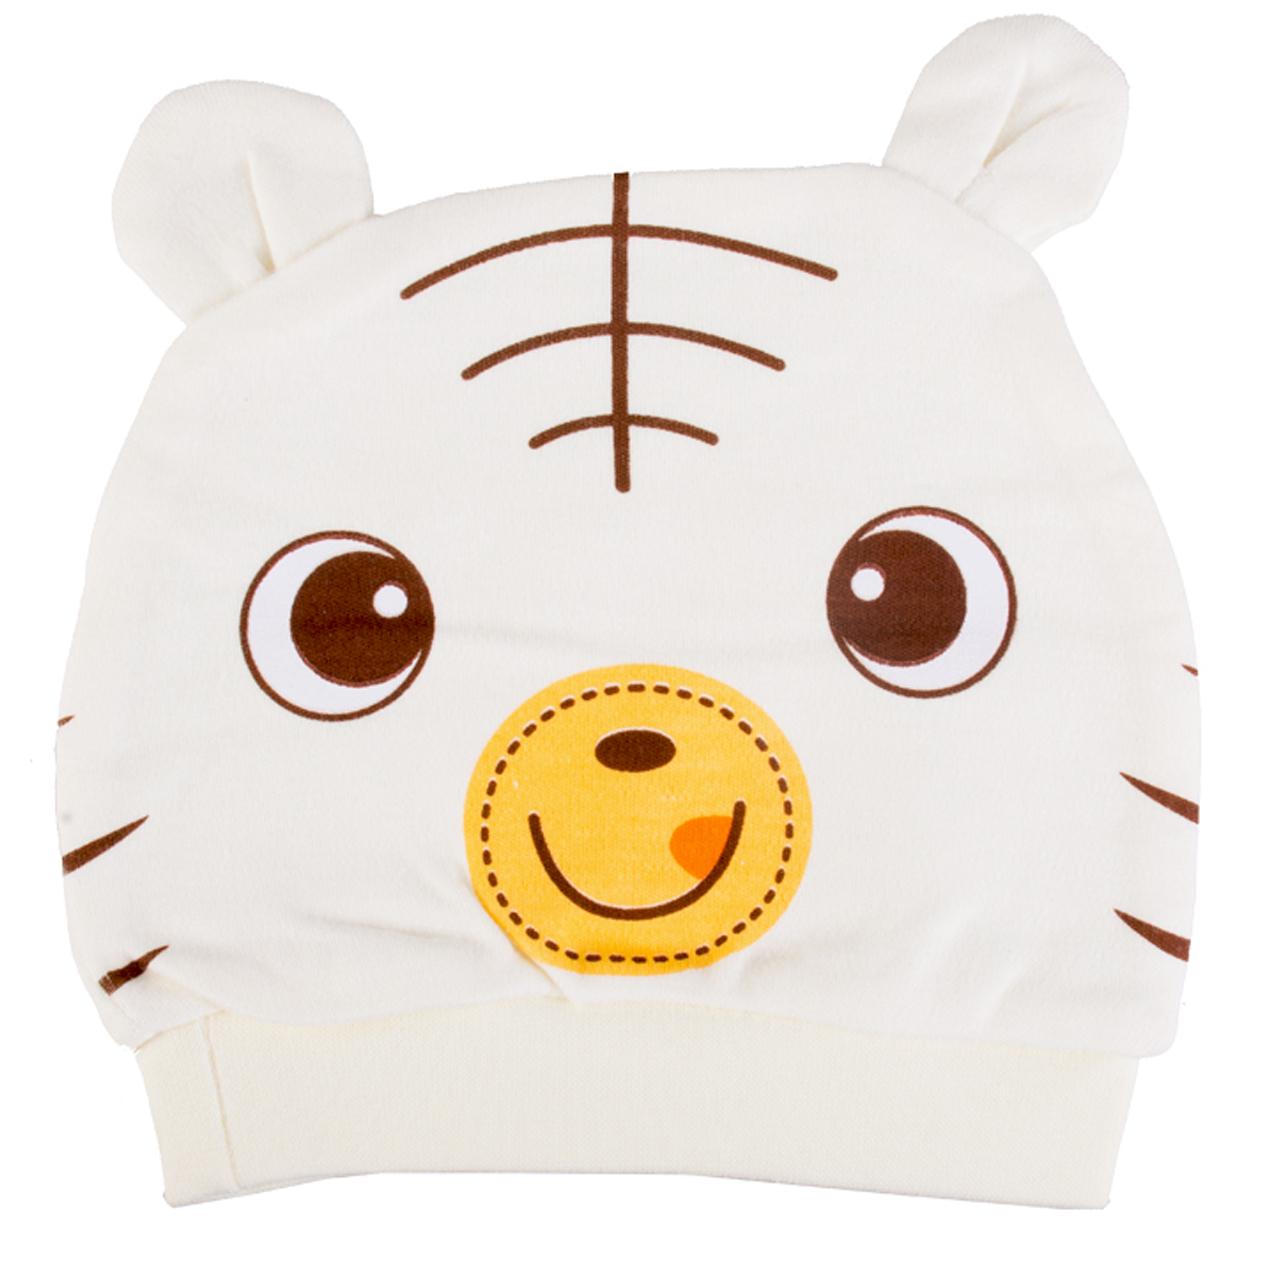 کلاه نوزاد مدل خرس کد 001